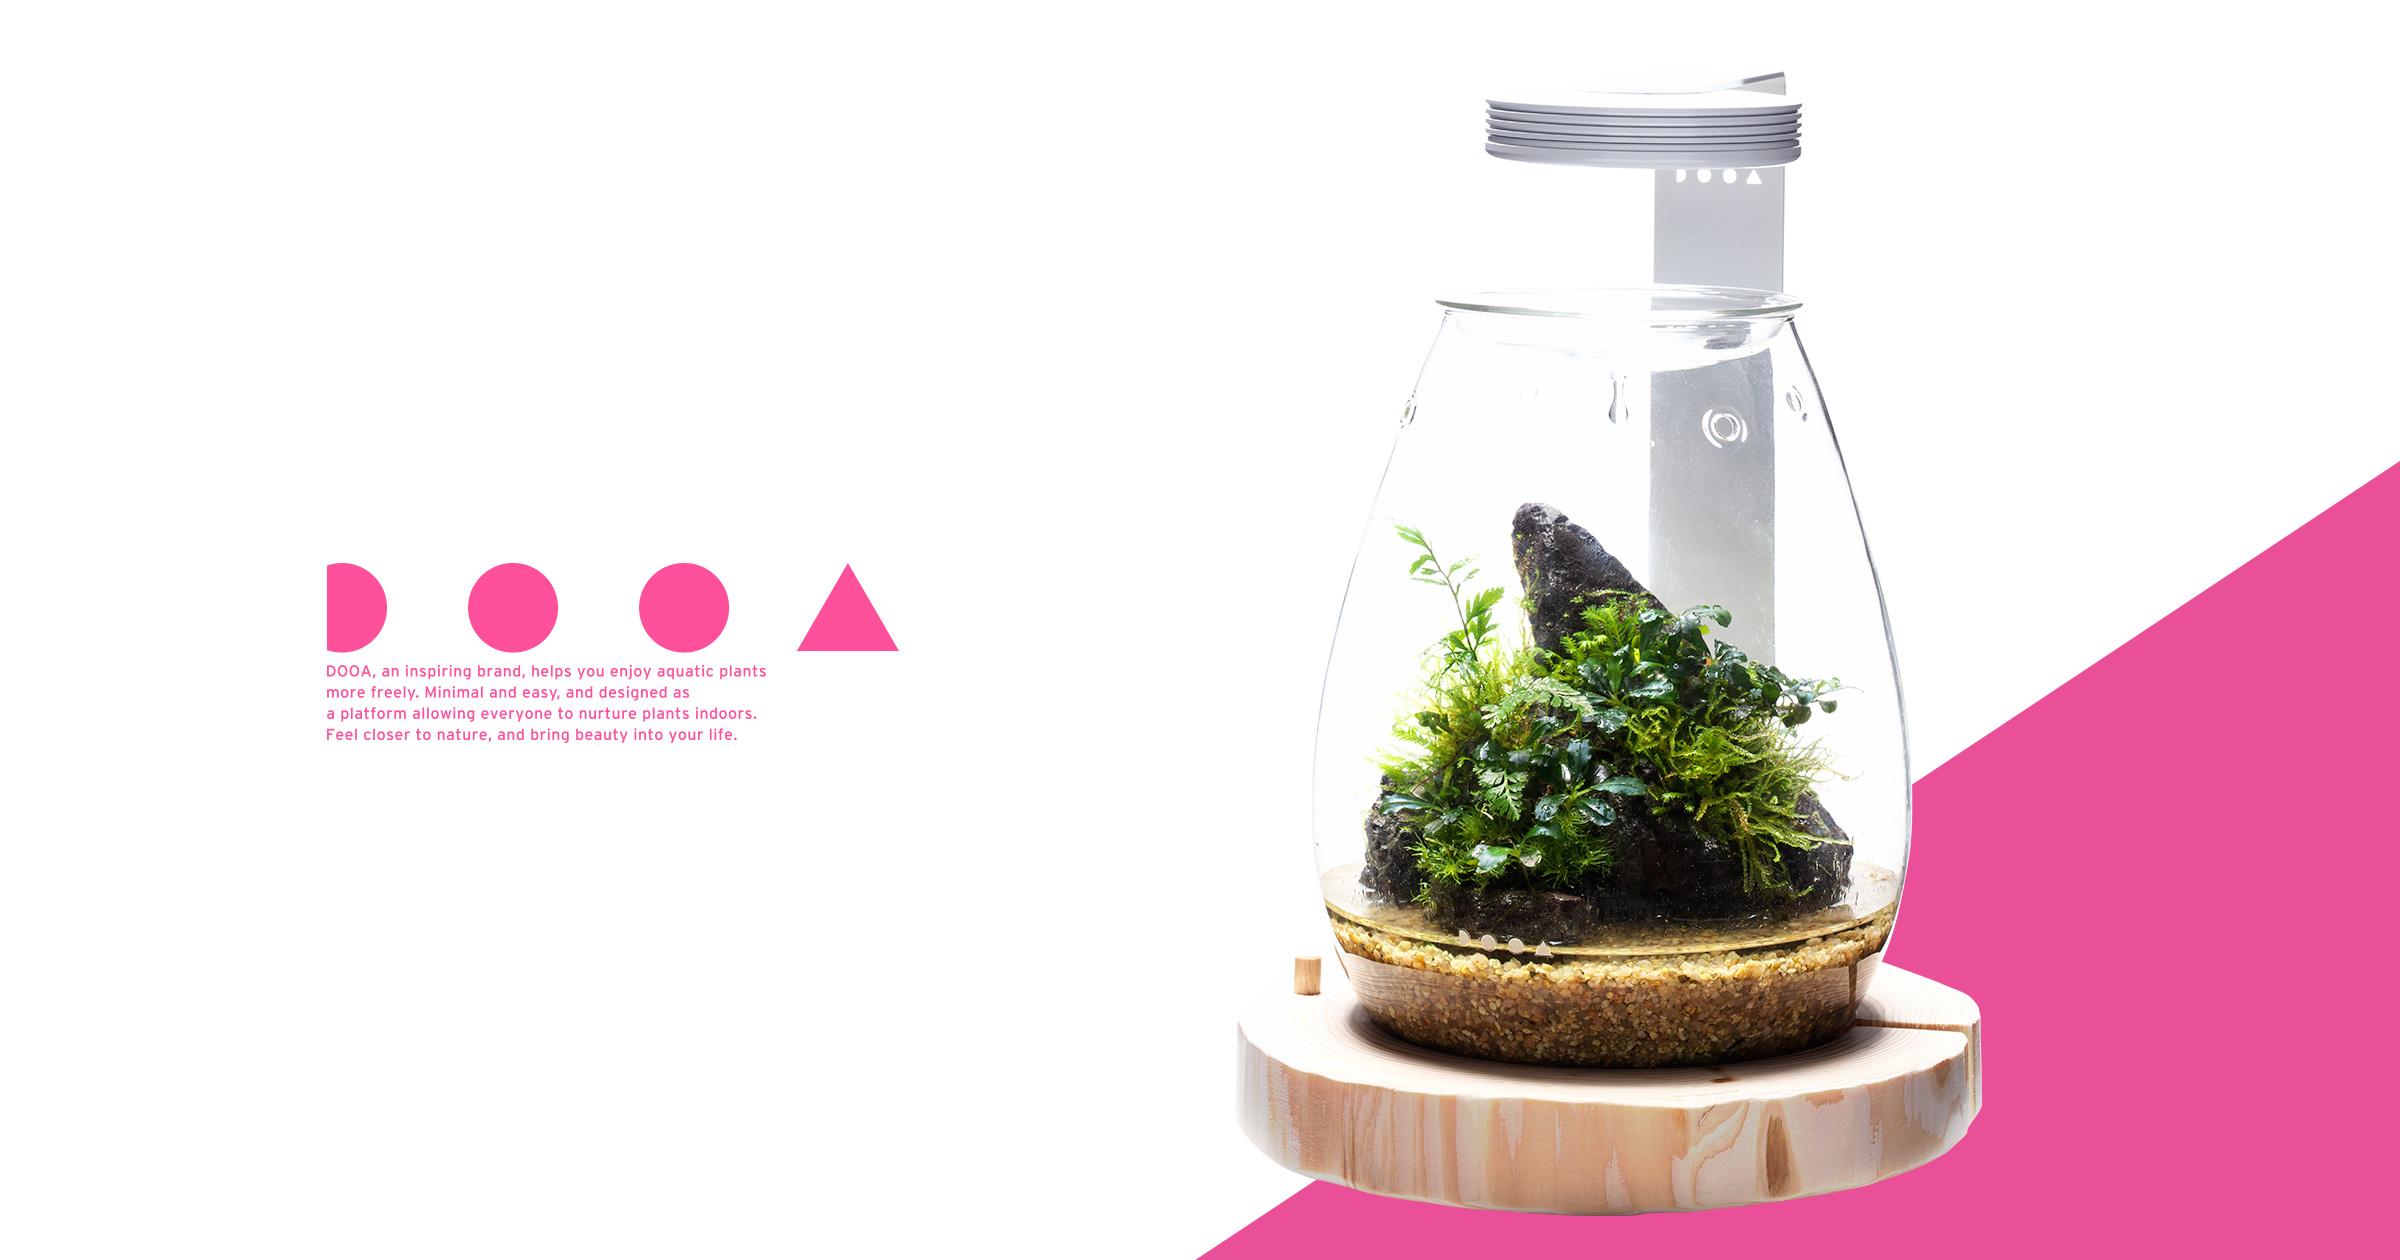 DOOA GLASS POT SHIZUKU 'Bring the Healing Power of Forest into A New Shape'